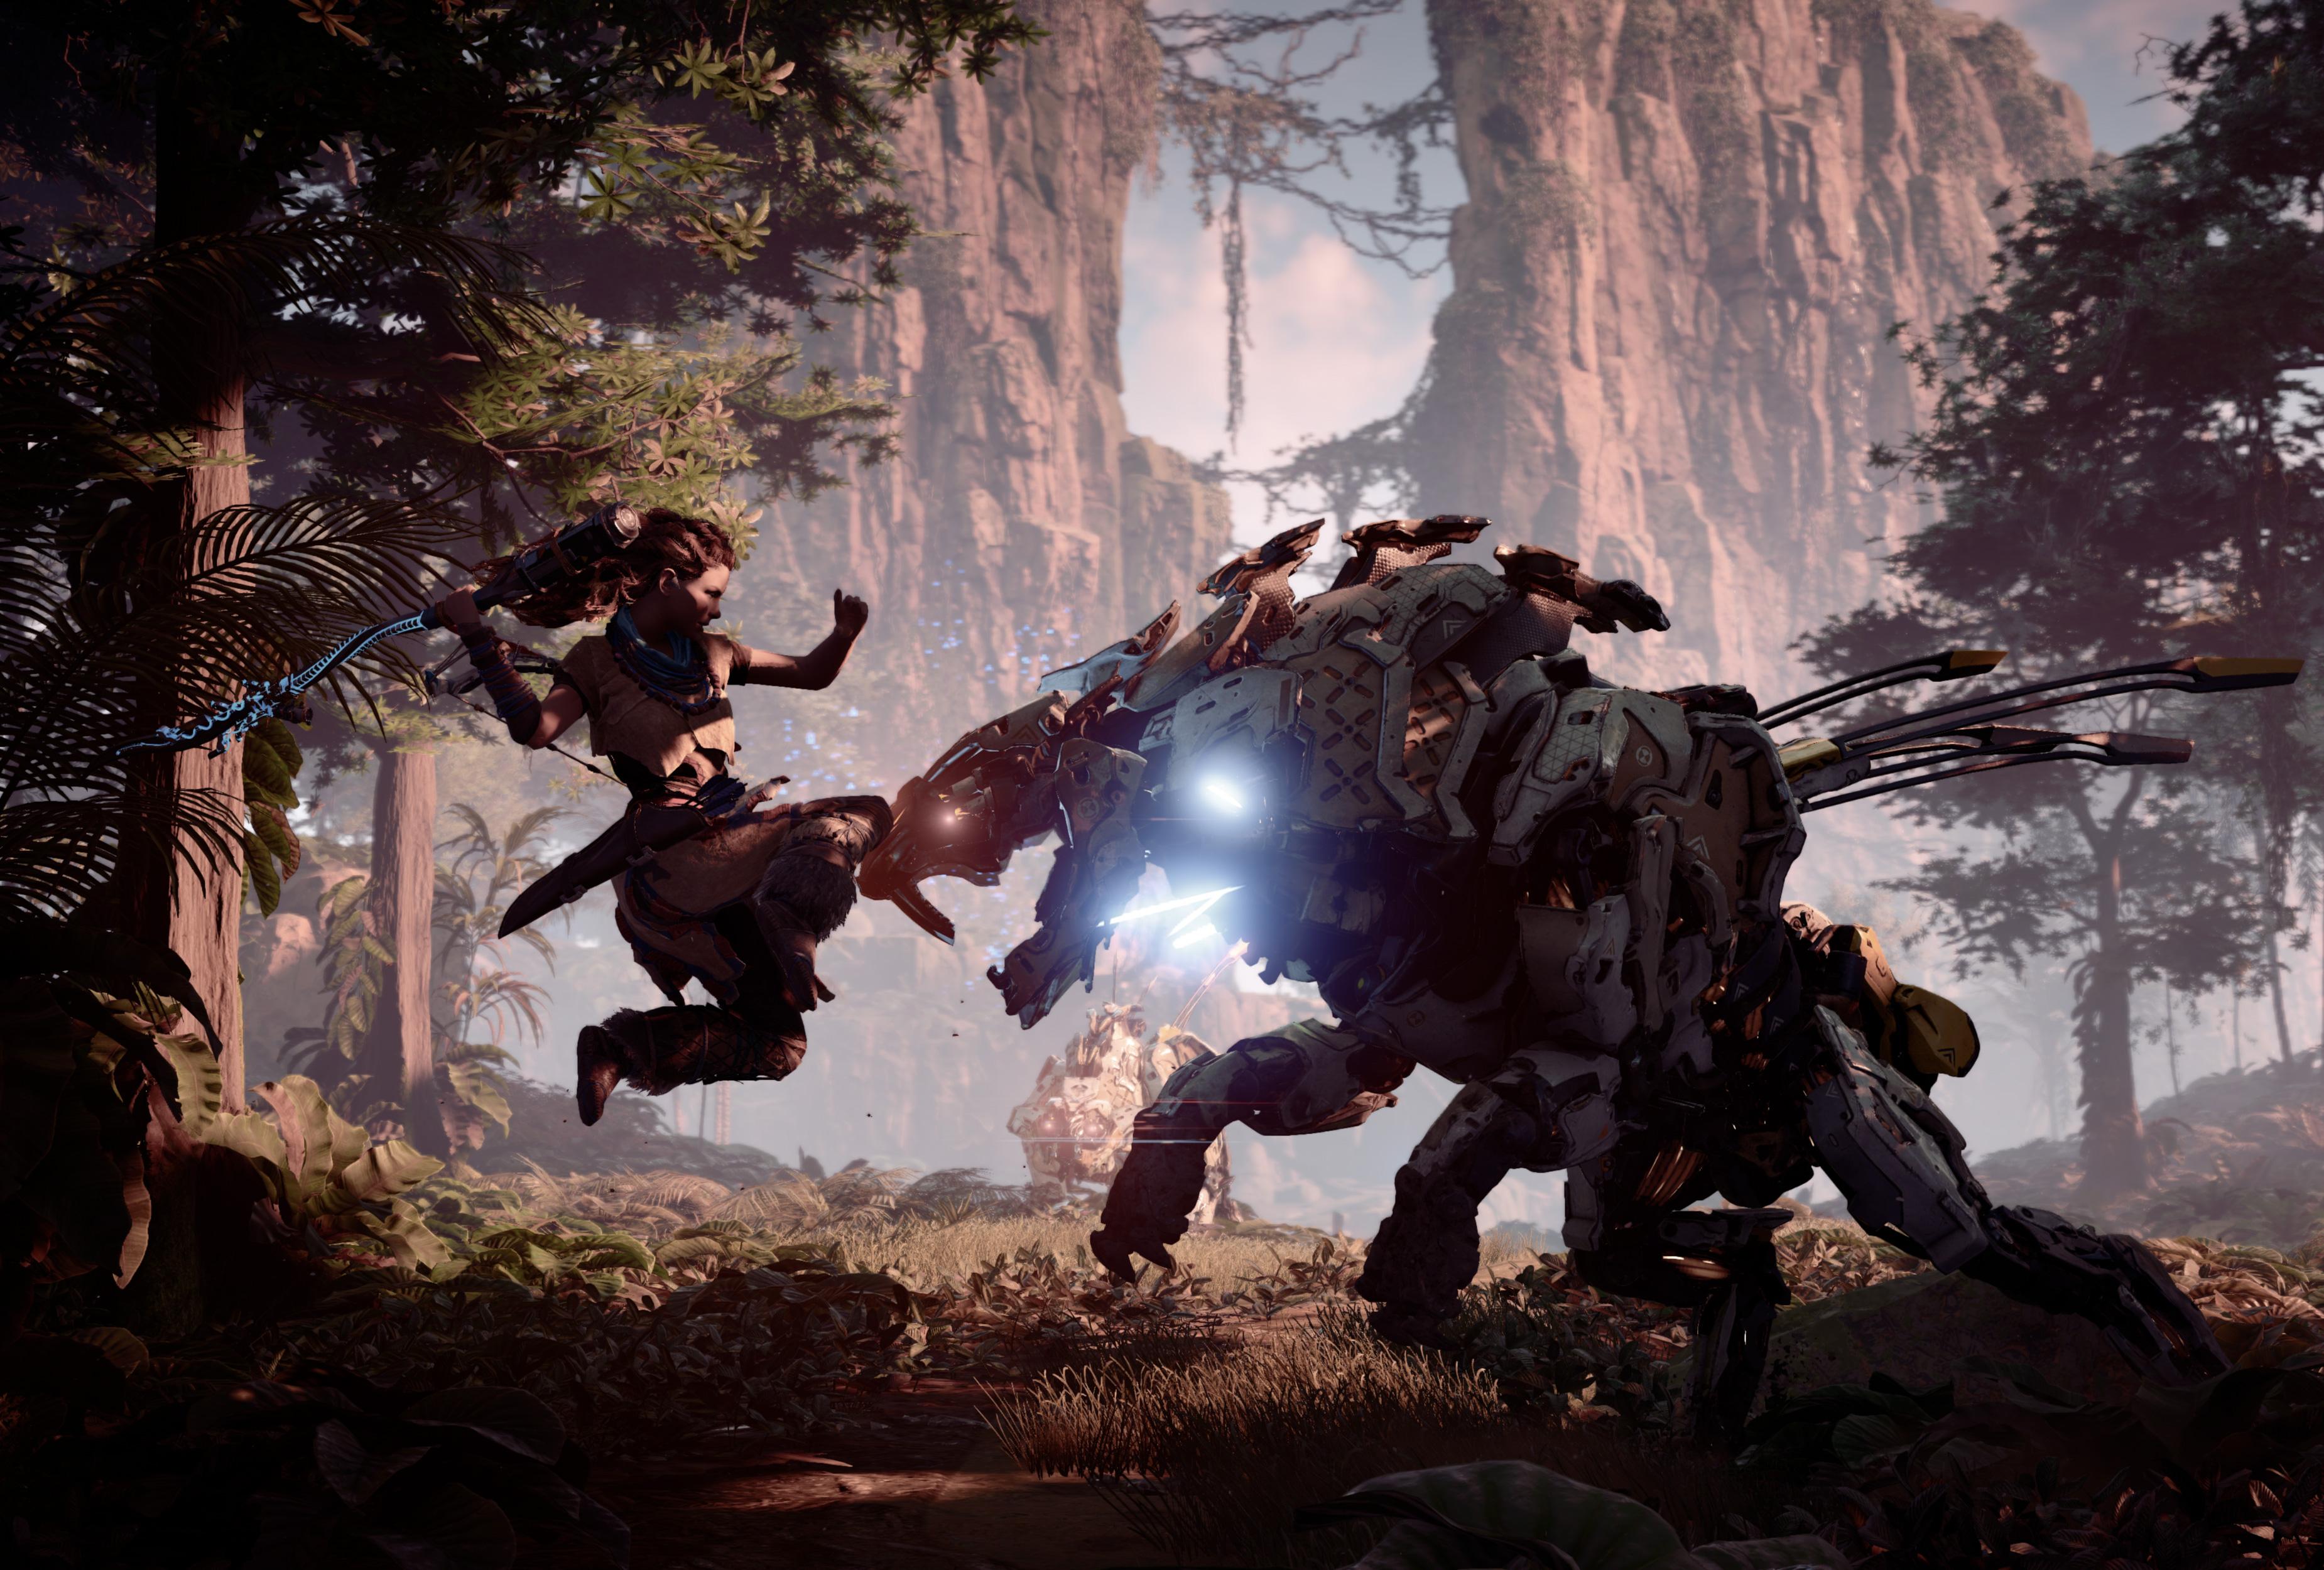 Horizon Zero Dawn Attack 4k, HD Games, 4k Wallpapers